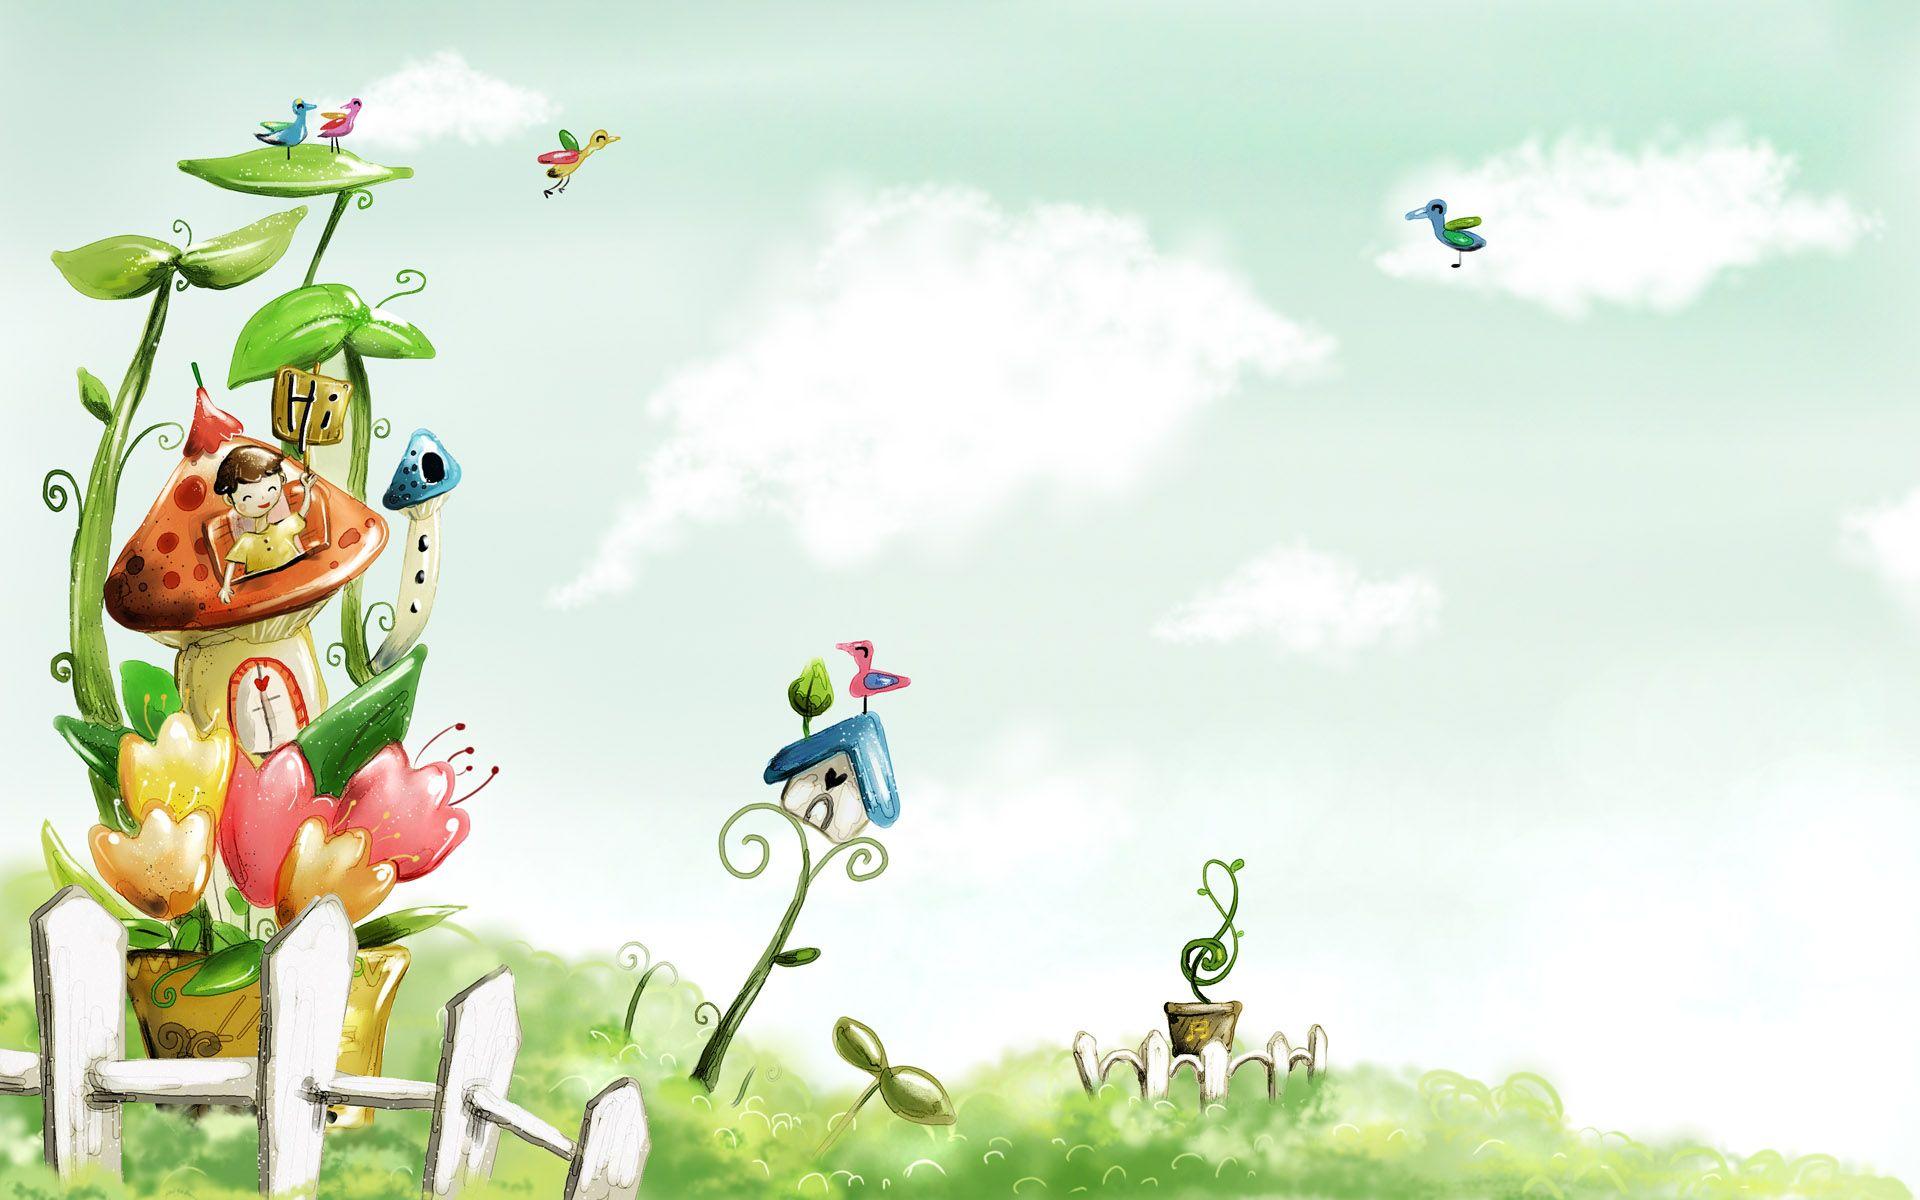 Download Spring Cartoon Landscape Wallpaper Animated #58229838 ...